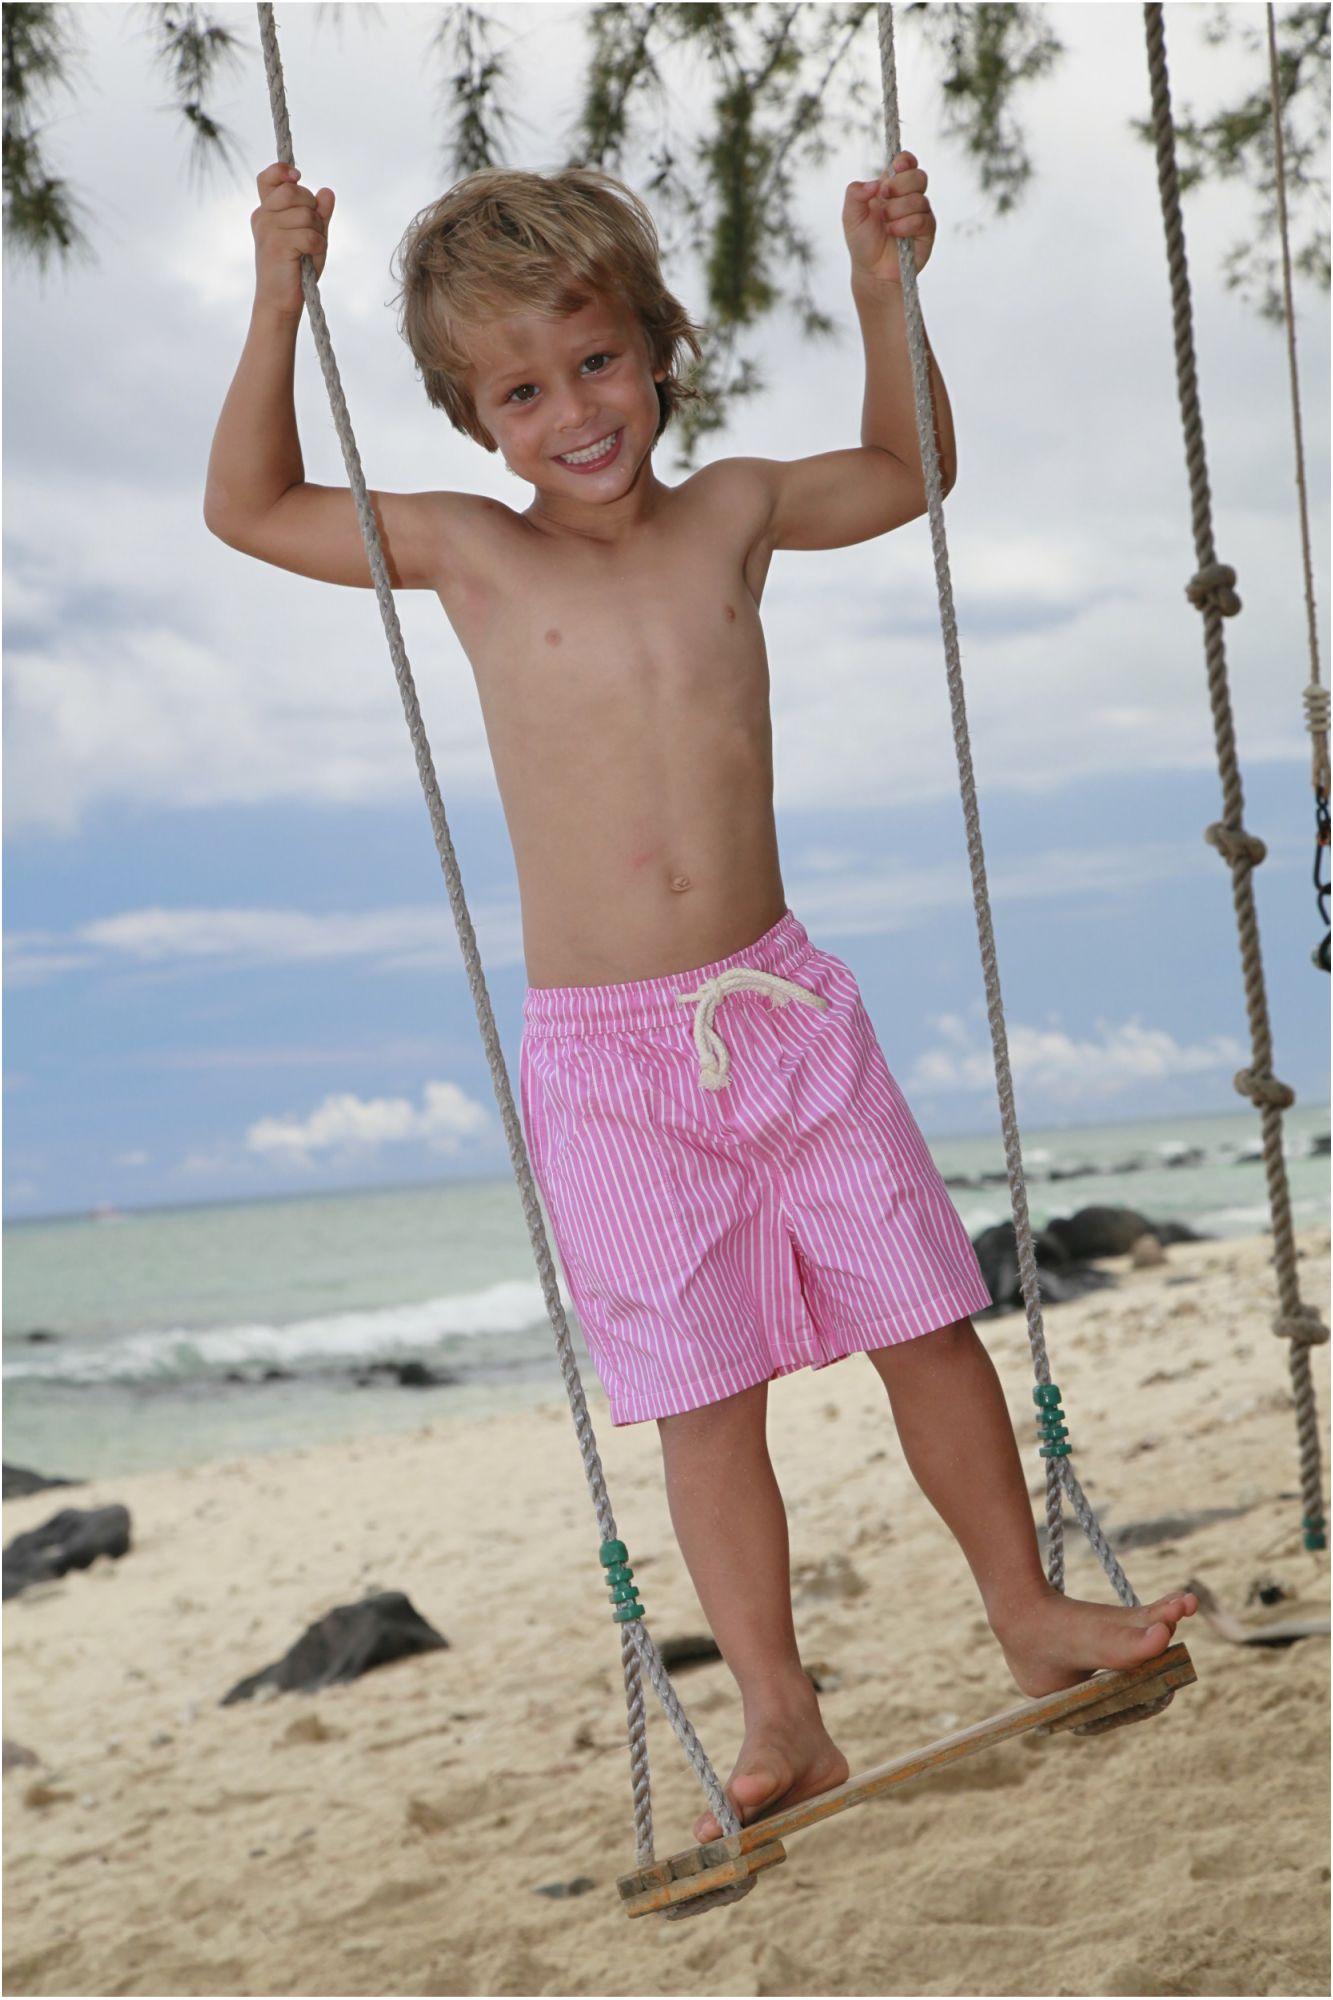 Bleu Chambre Garcon : Maillot boxer garçon poisson rose rayé blanc l orangerie